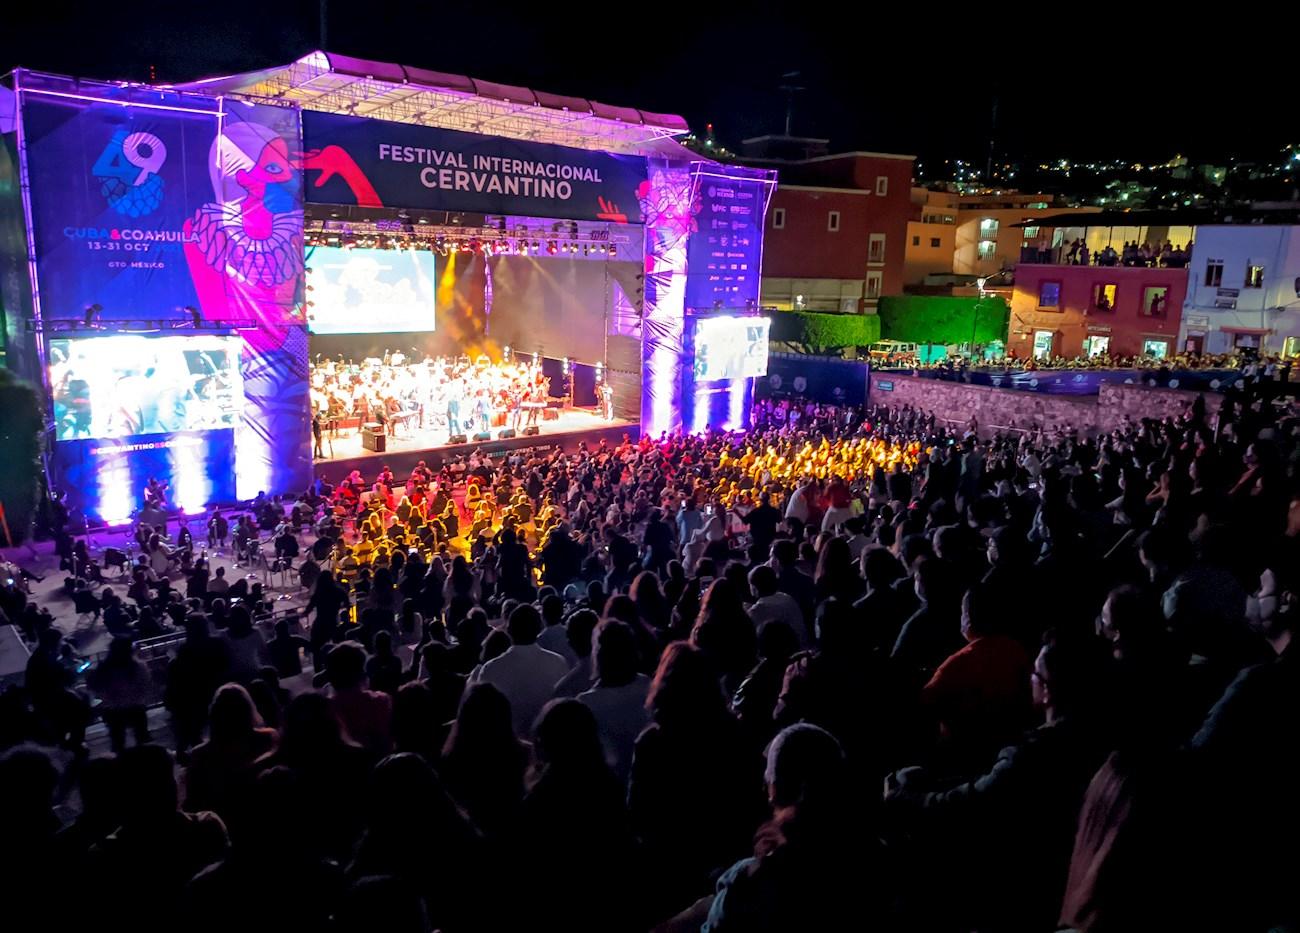 Festival Internacional Cervantino en Guanajuato